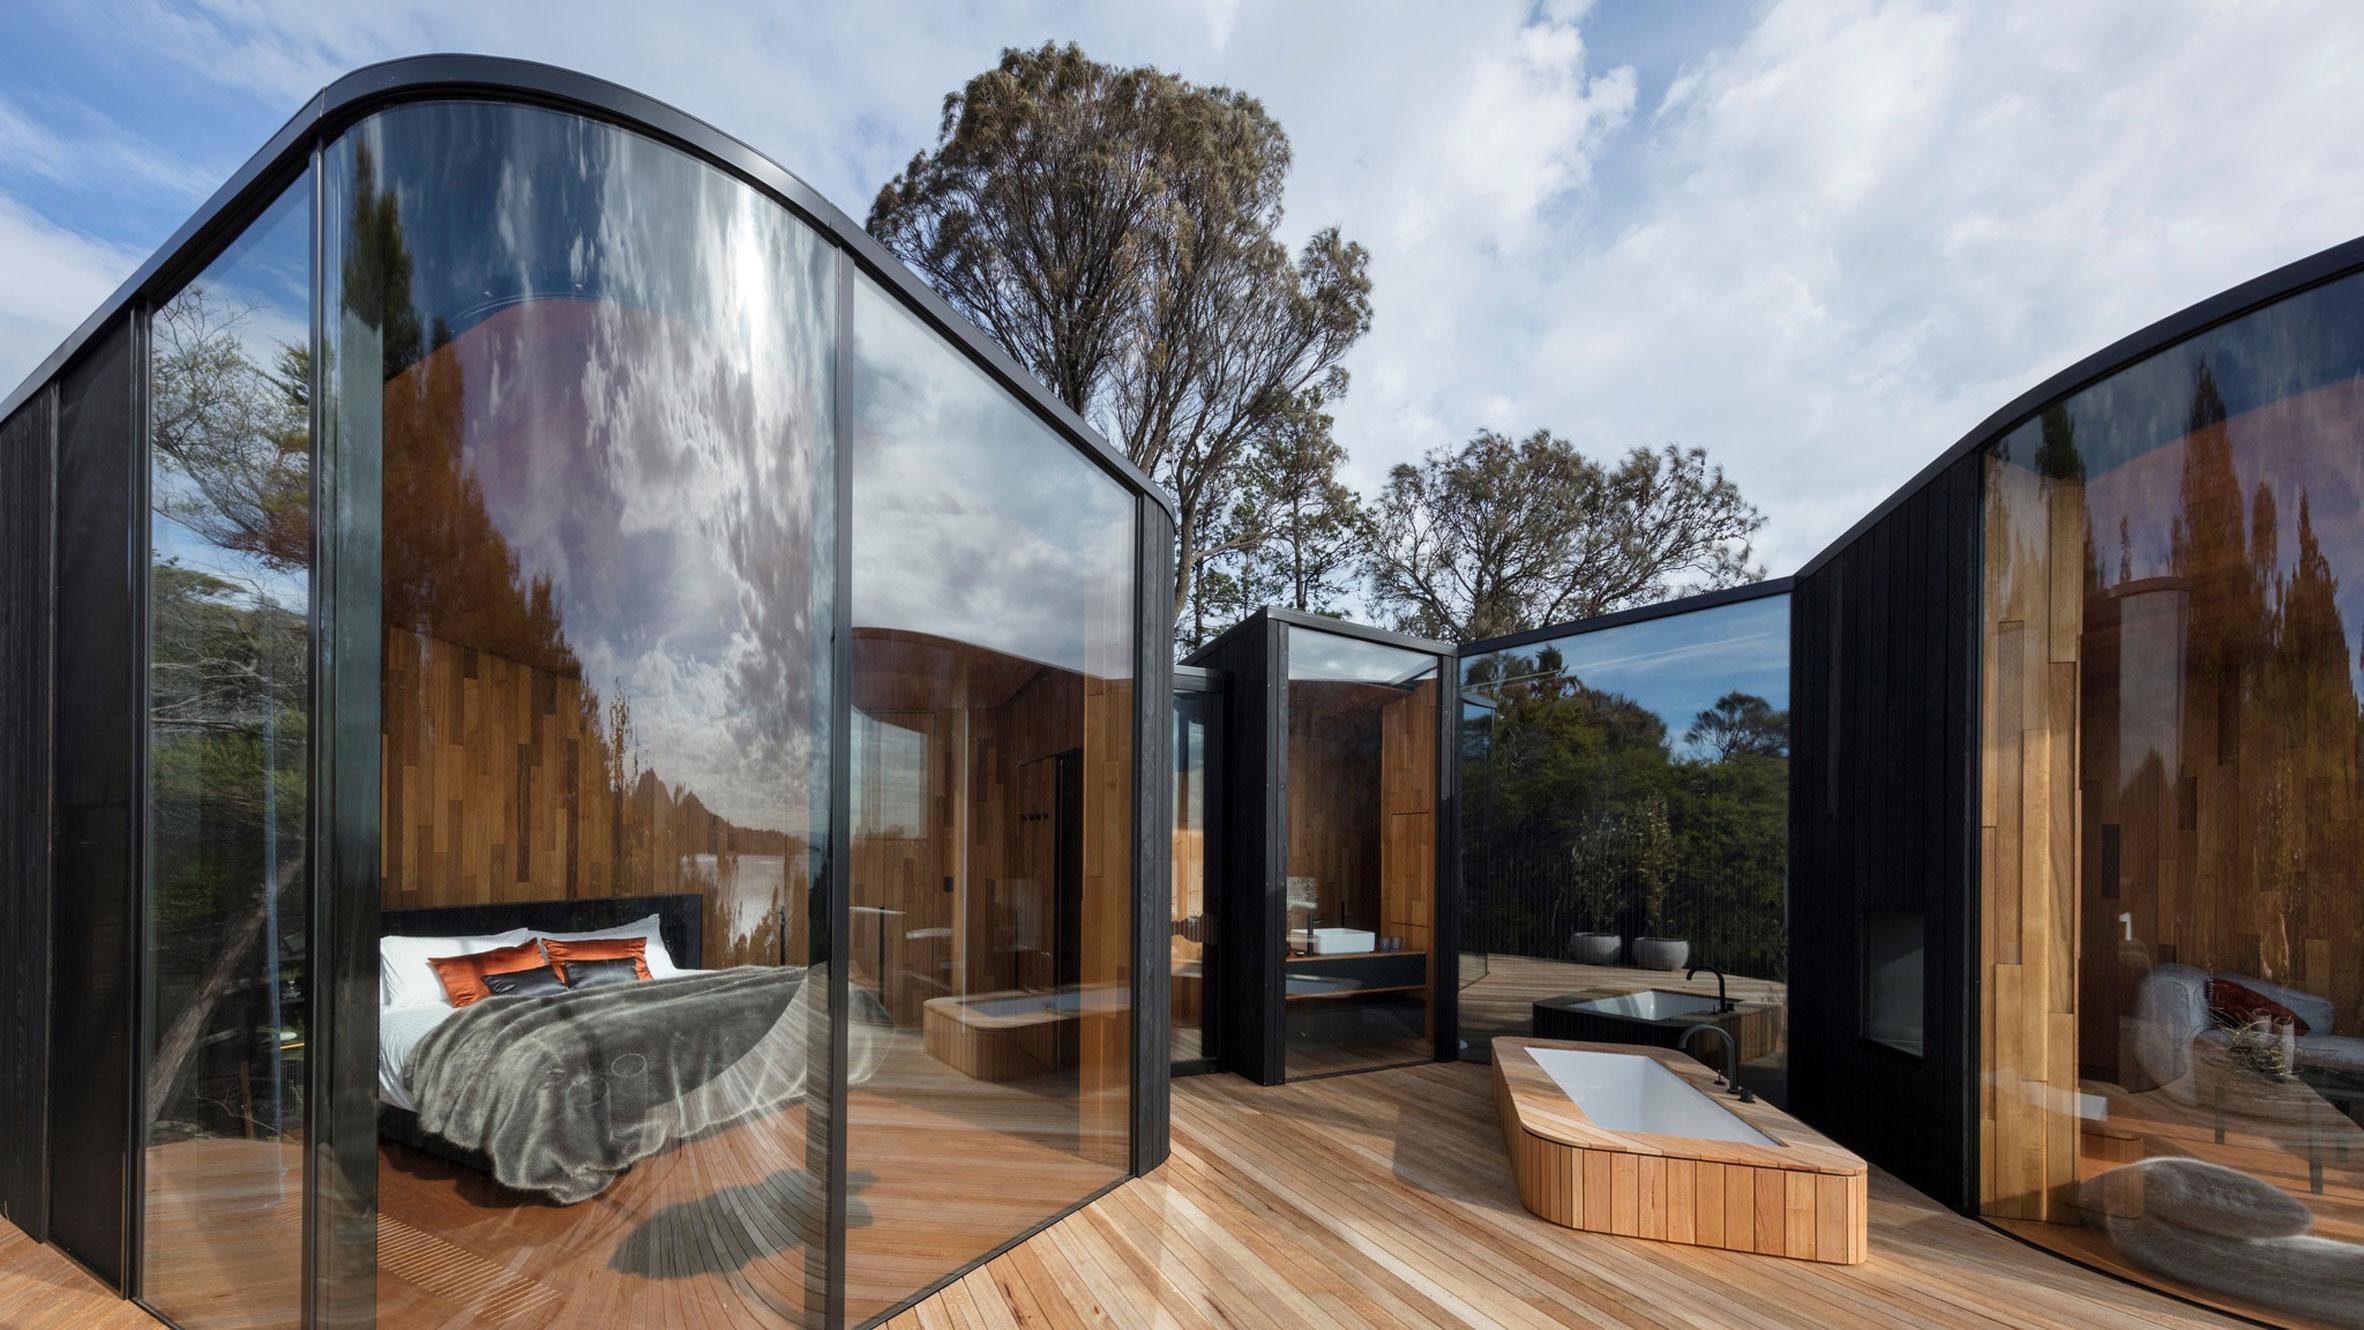 Freycinet Lodge Coastal Pavilions, Tasmania, Australia, by Liminal Architecture